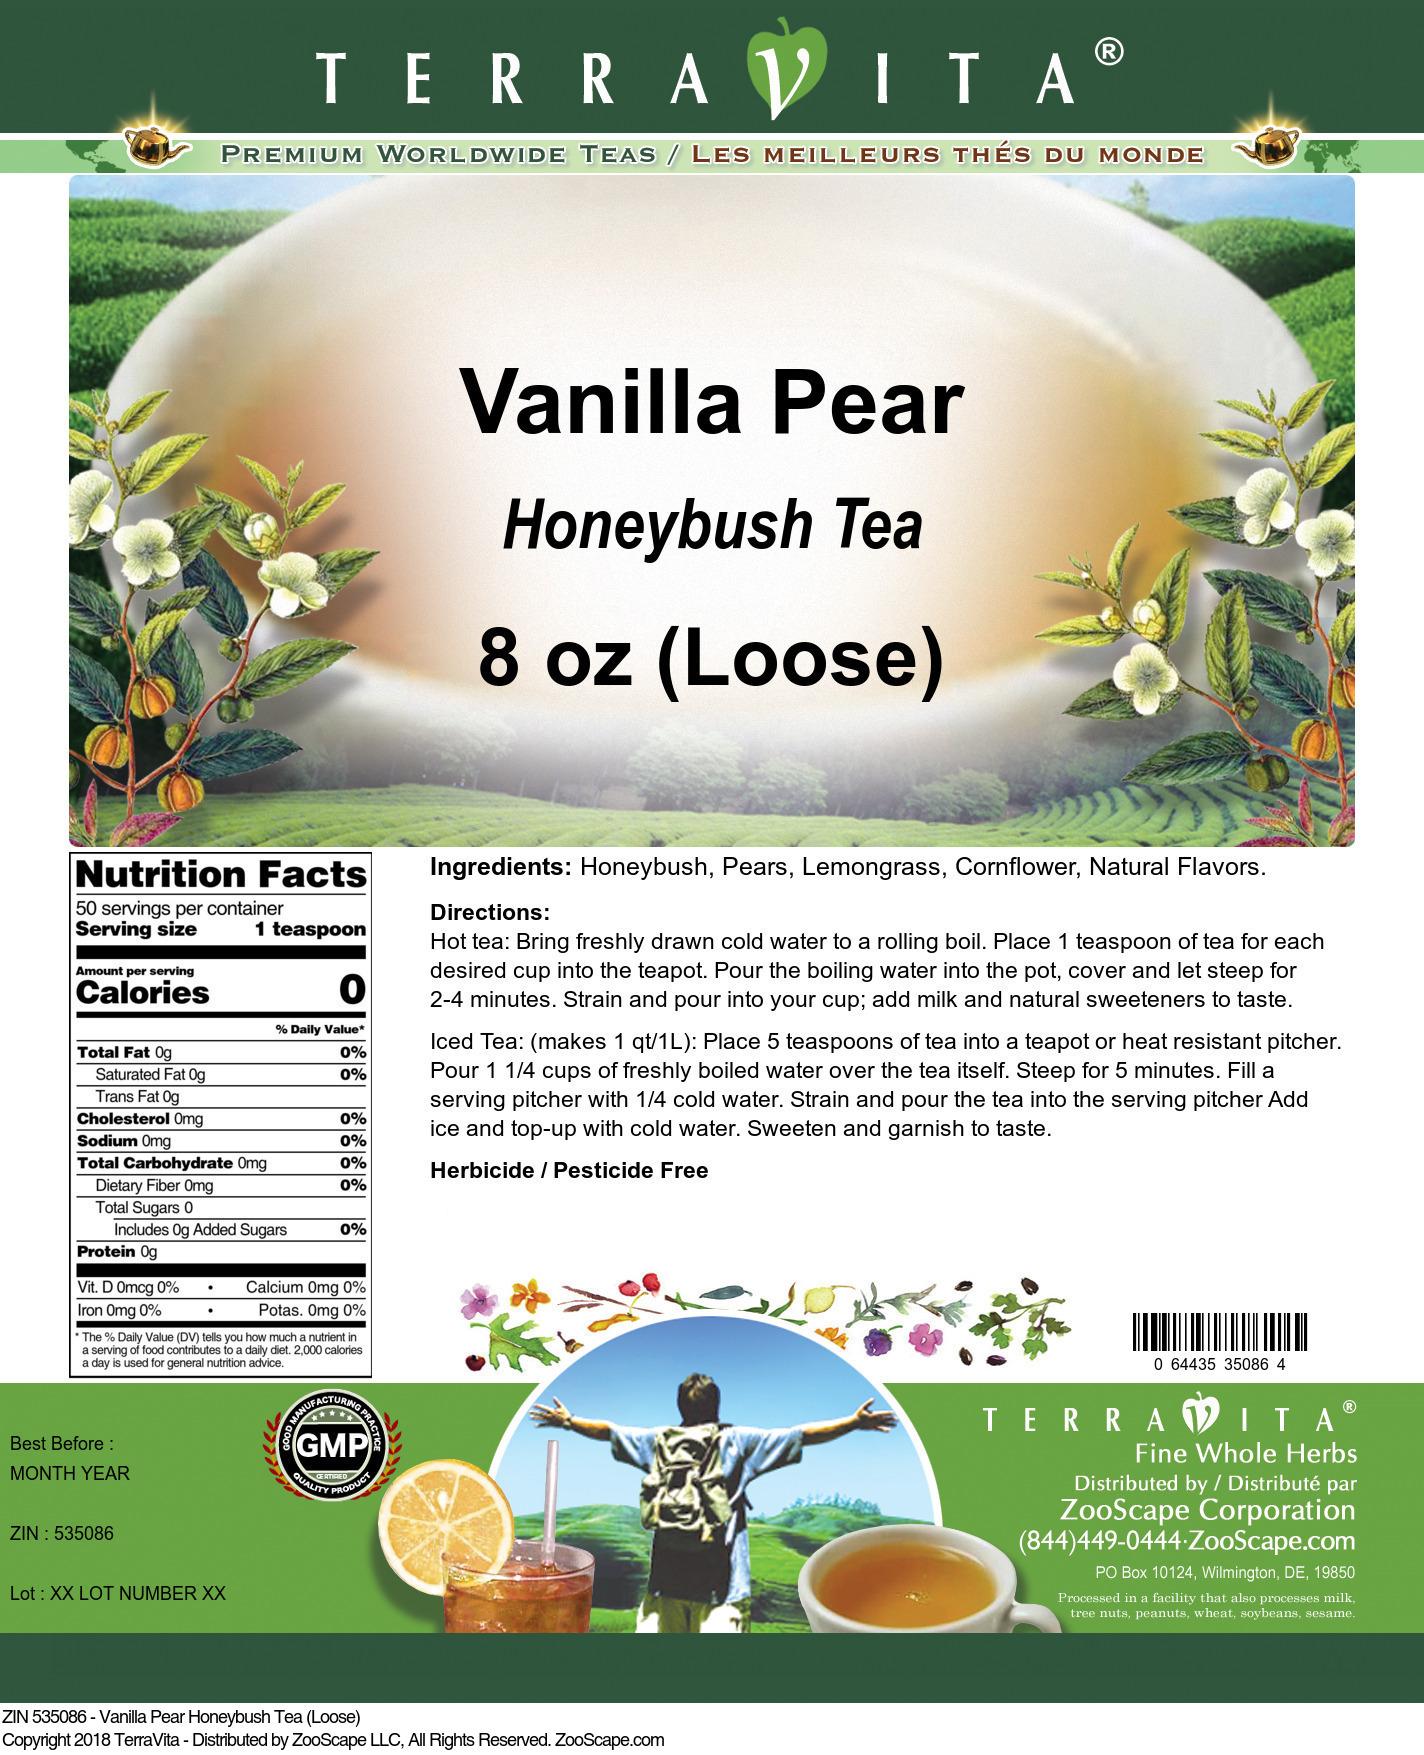 Vanilla Pear Honeybush Tea (Loose)